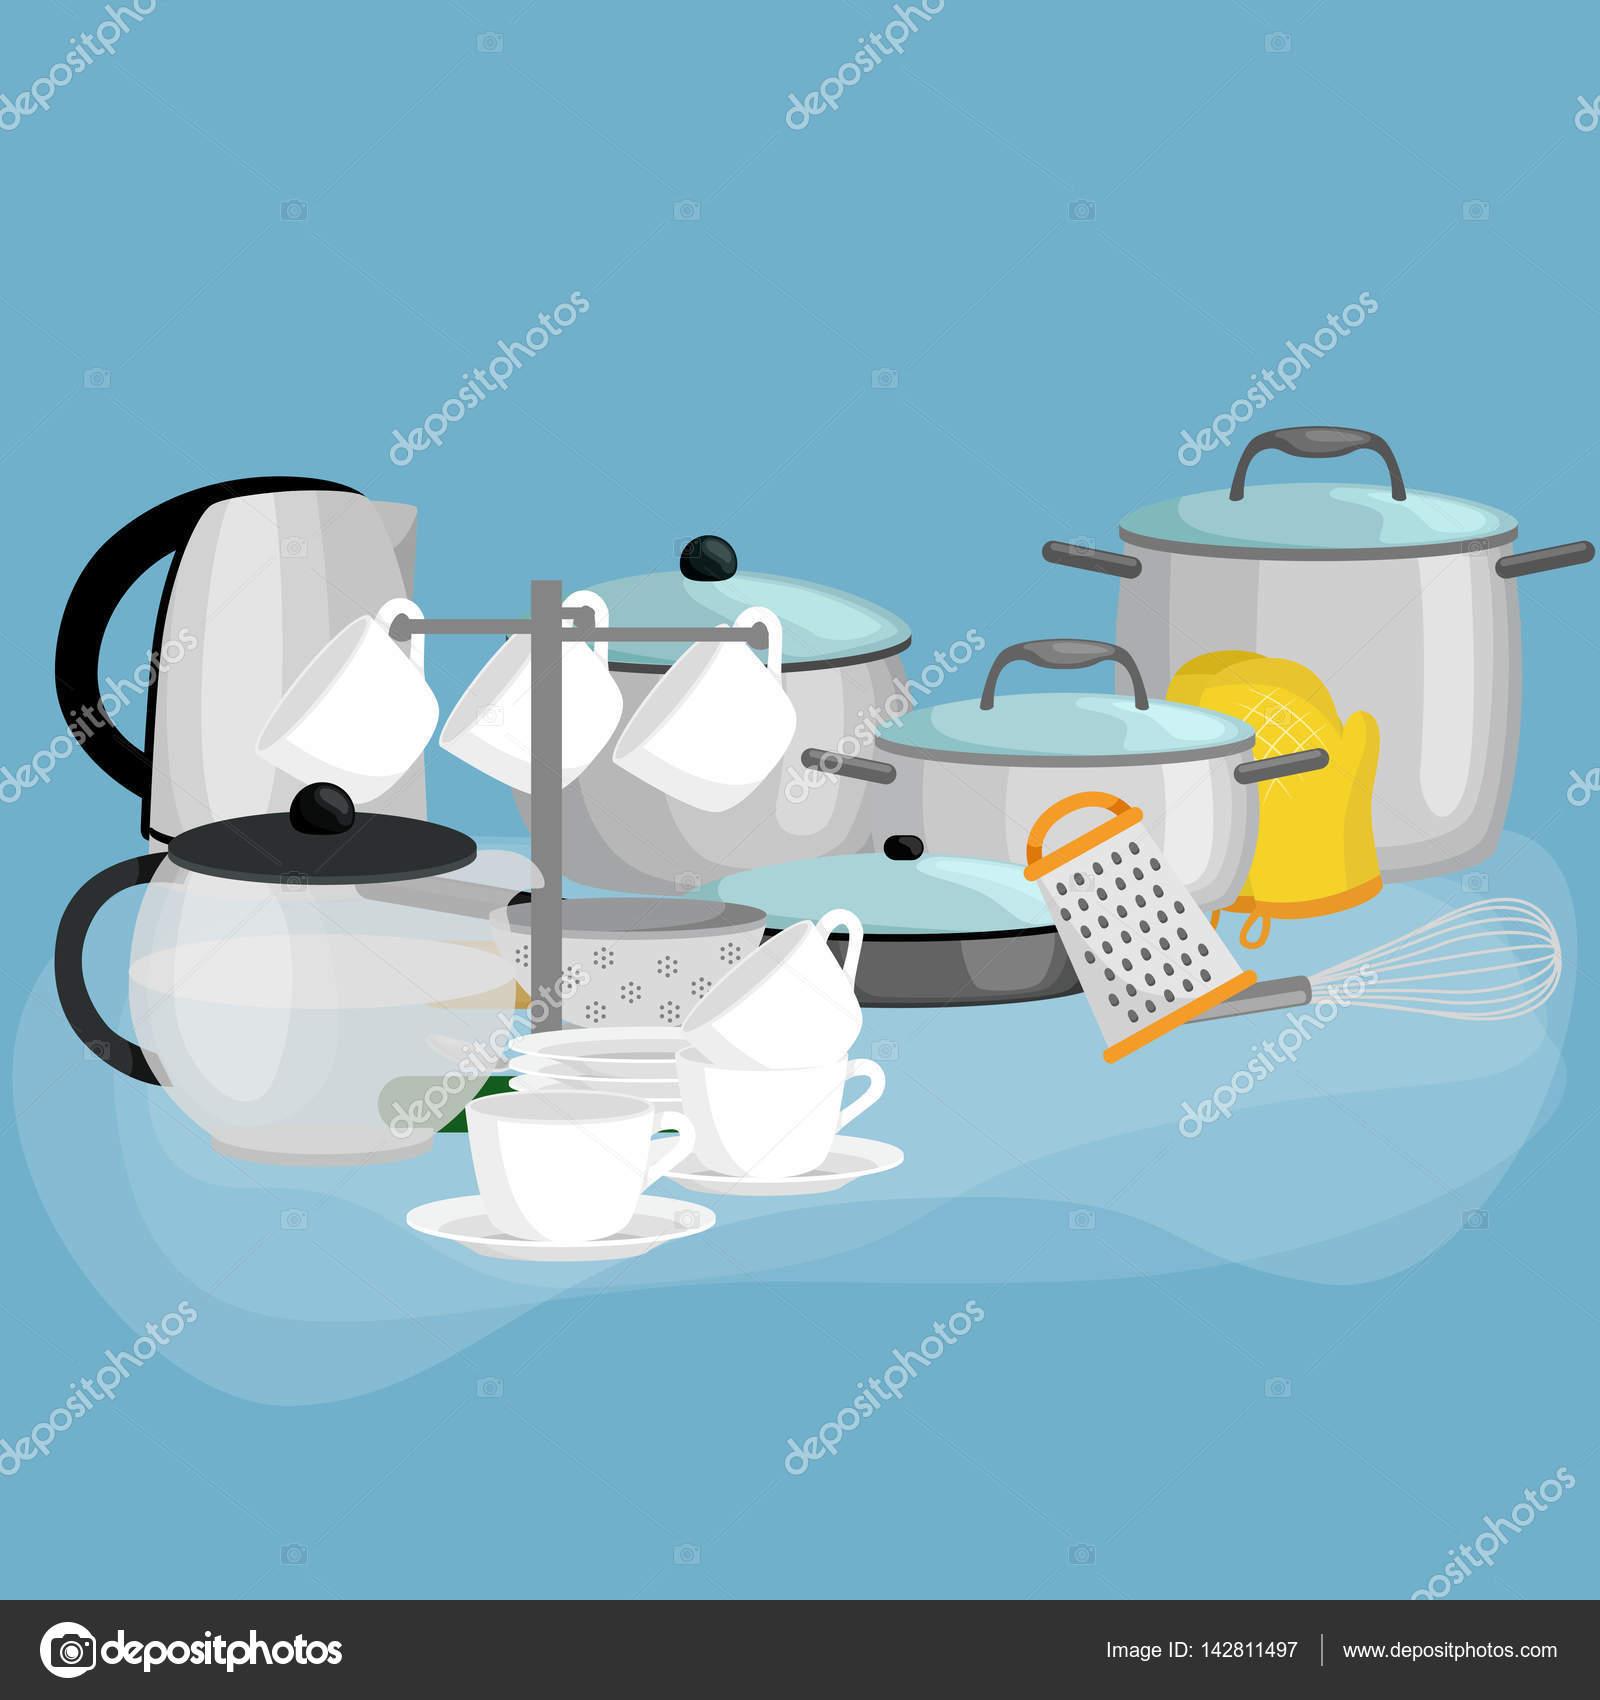 Cartoon kitchenware utensil collection.Steel kitchen household ...